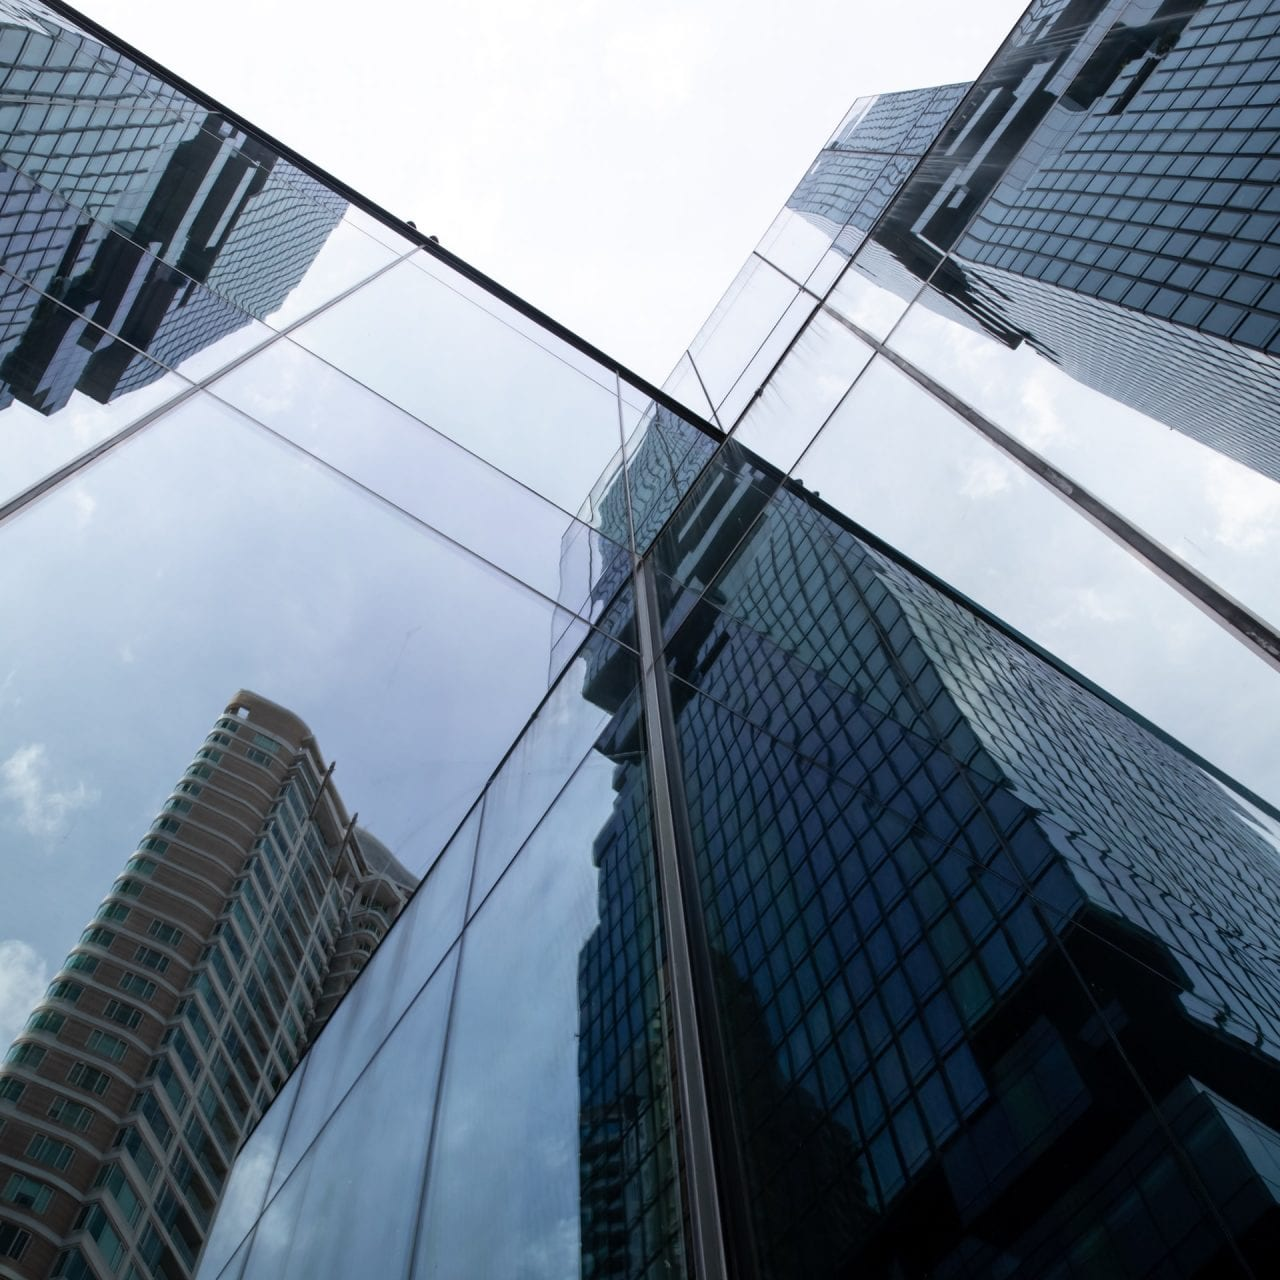 https://peninsulacanada.com/wp-content/uploads/2021/06/Office-Tower-Image-1280x1280.jpeg